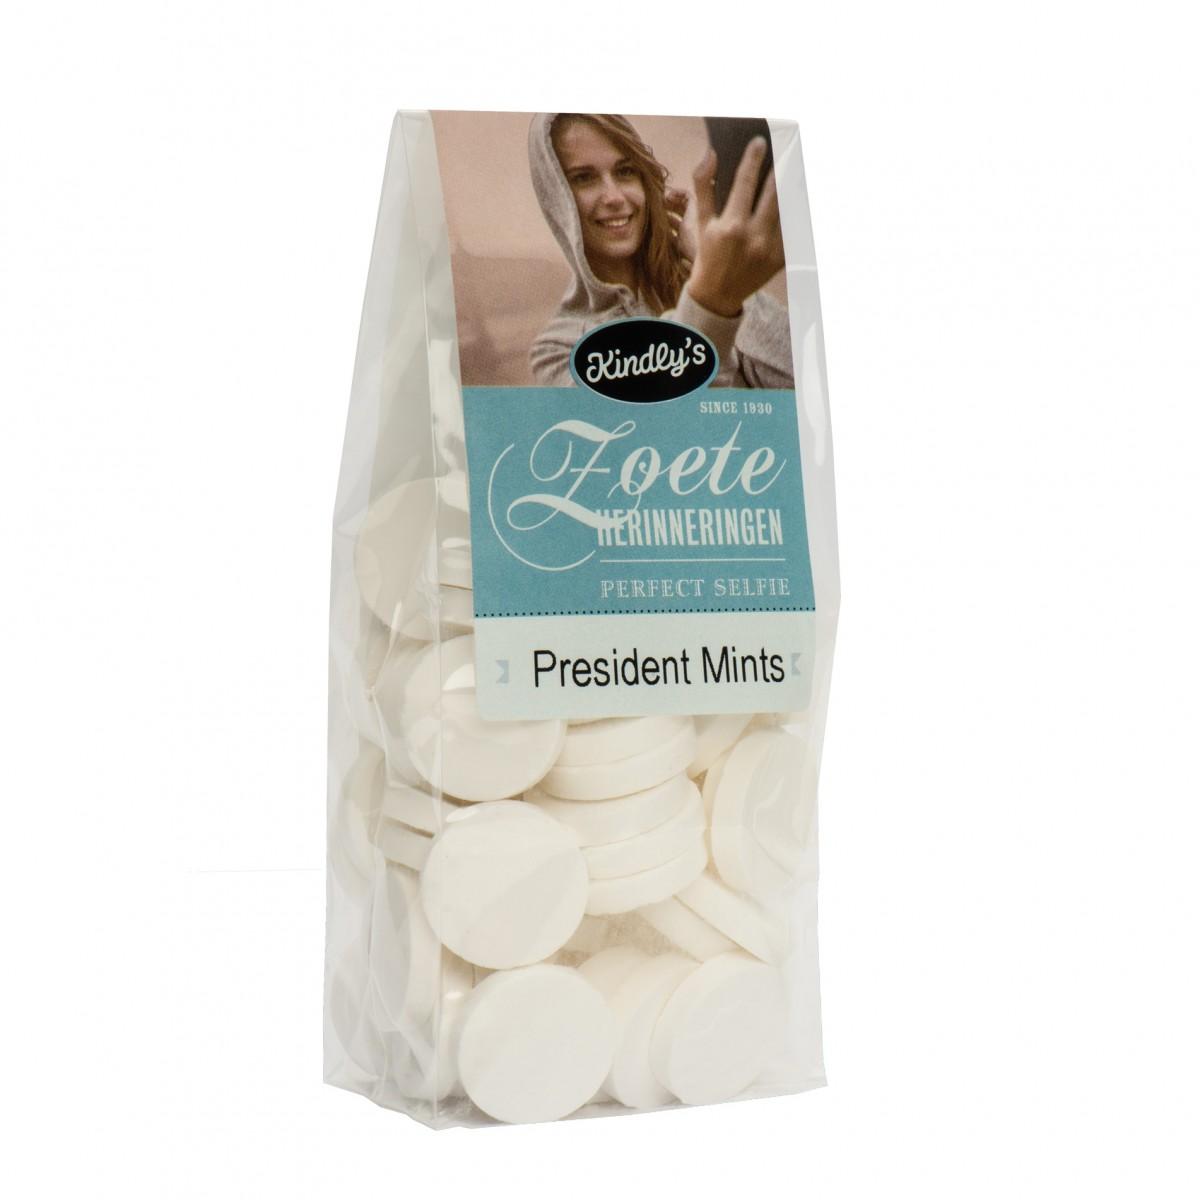 President Mints